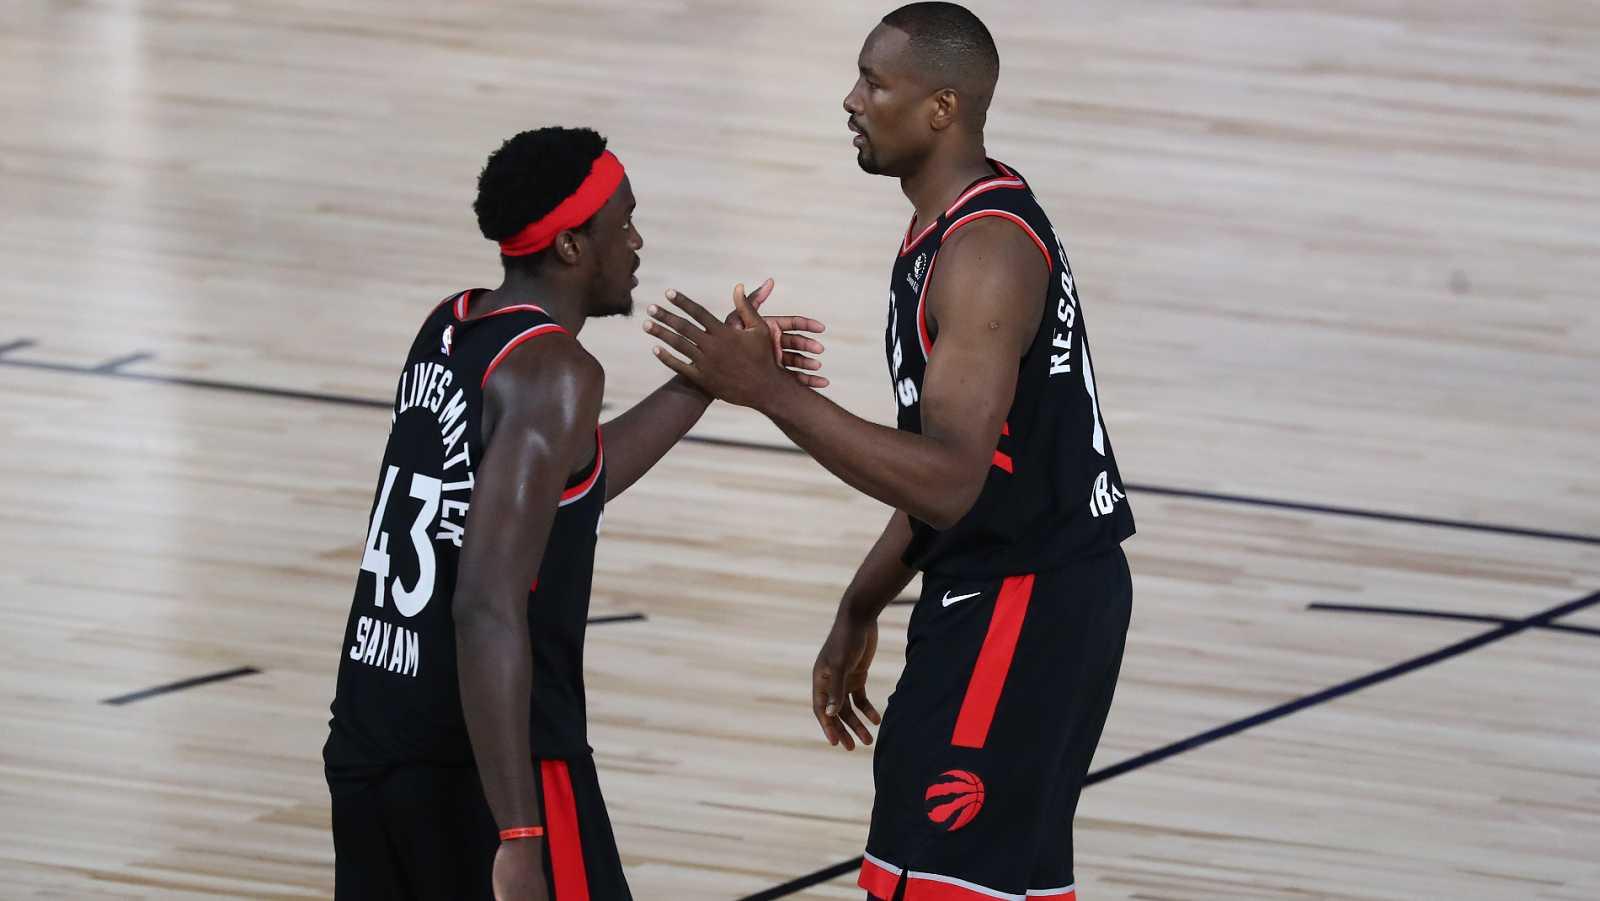 Vídeo: Los Celtics fallan triples e Ibaka los mete: los Raptors empatan la serie